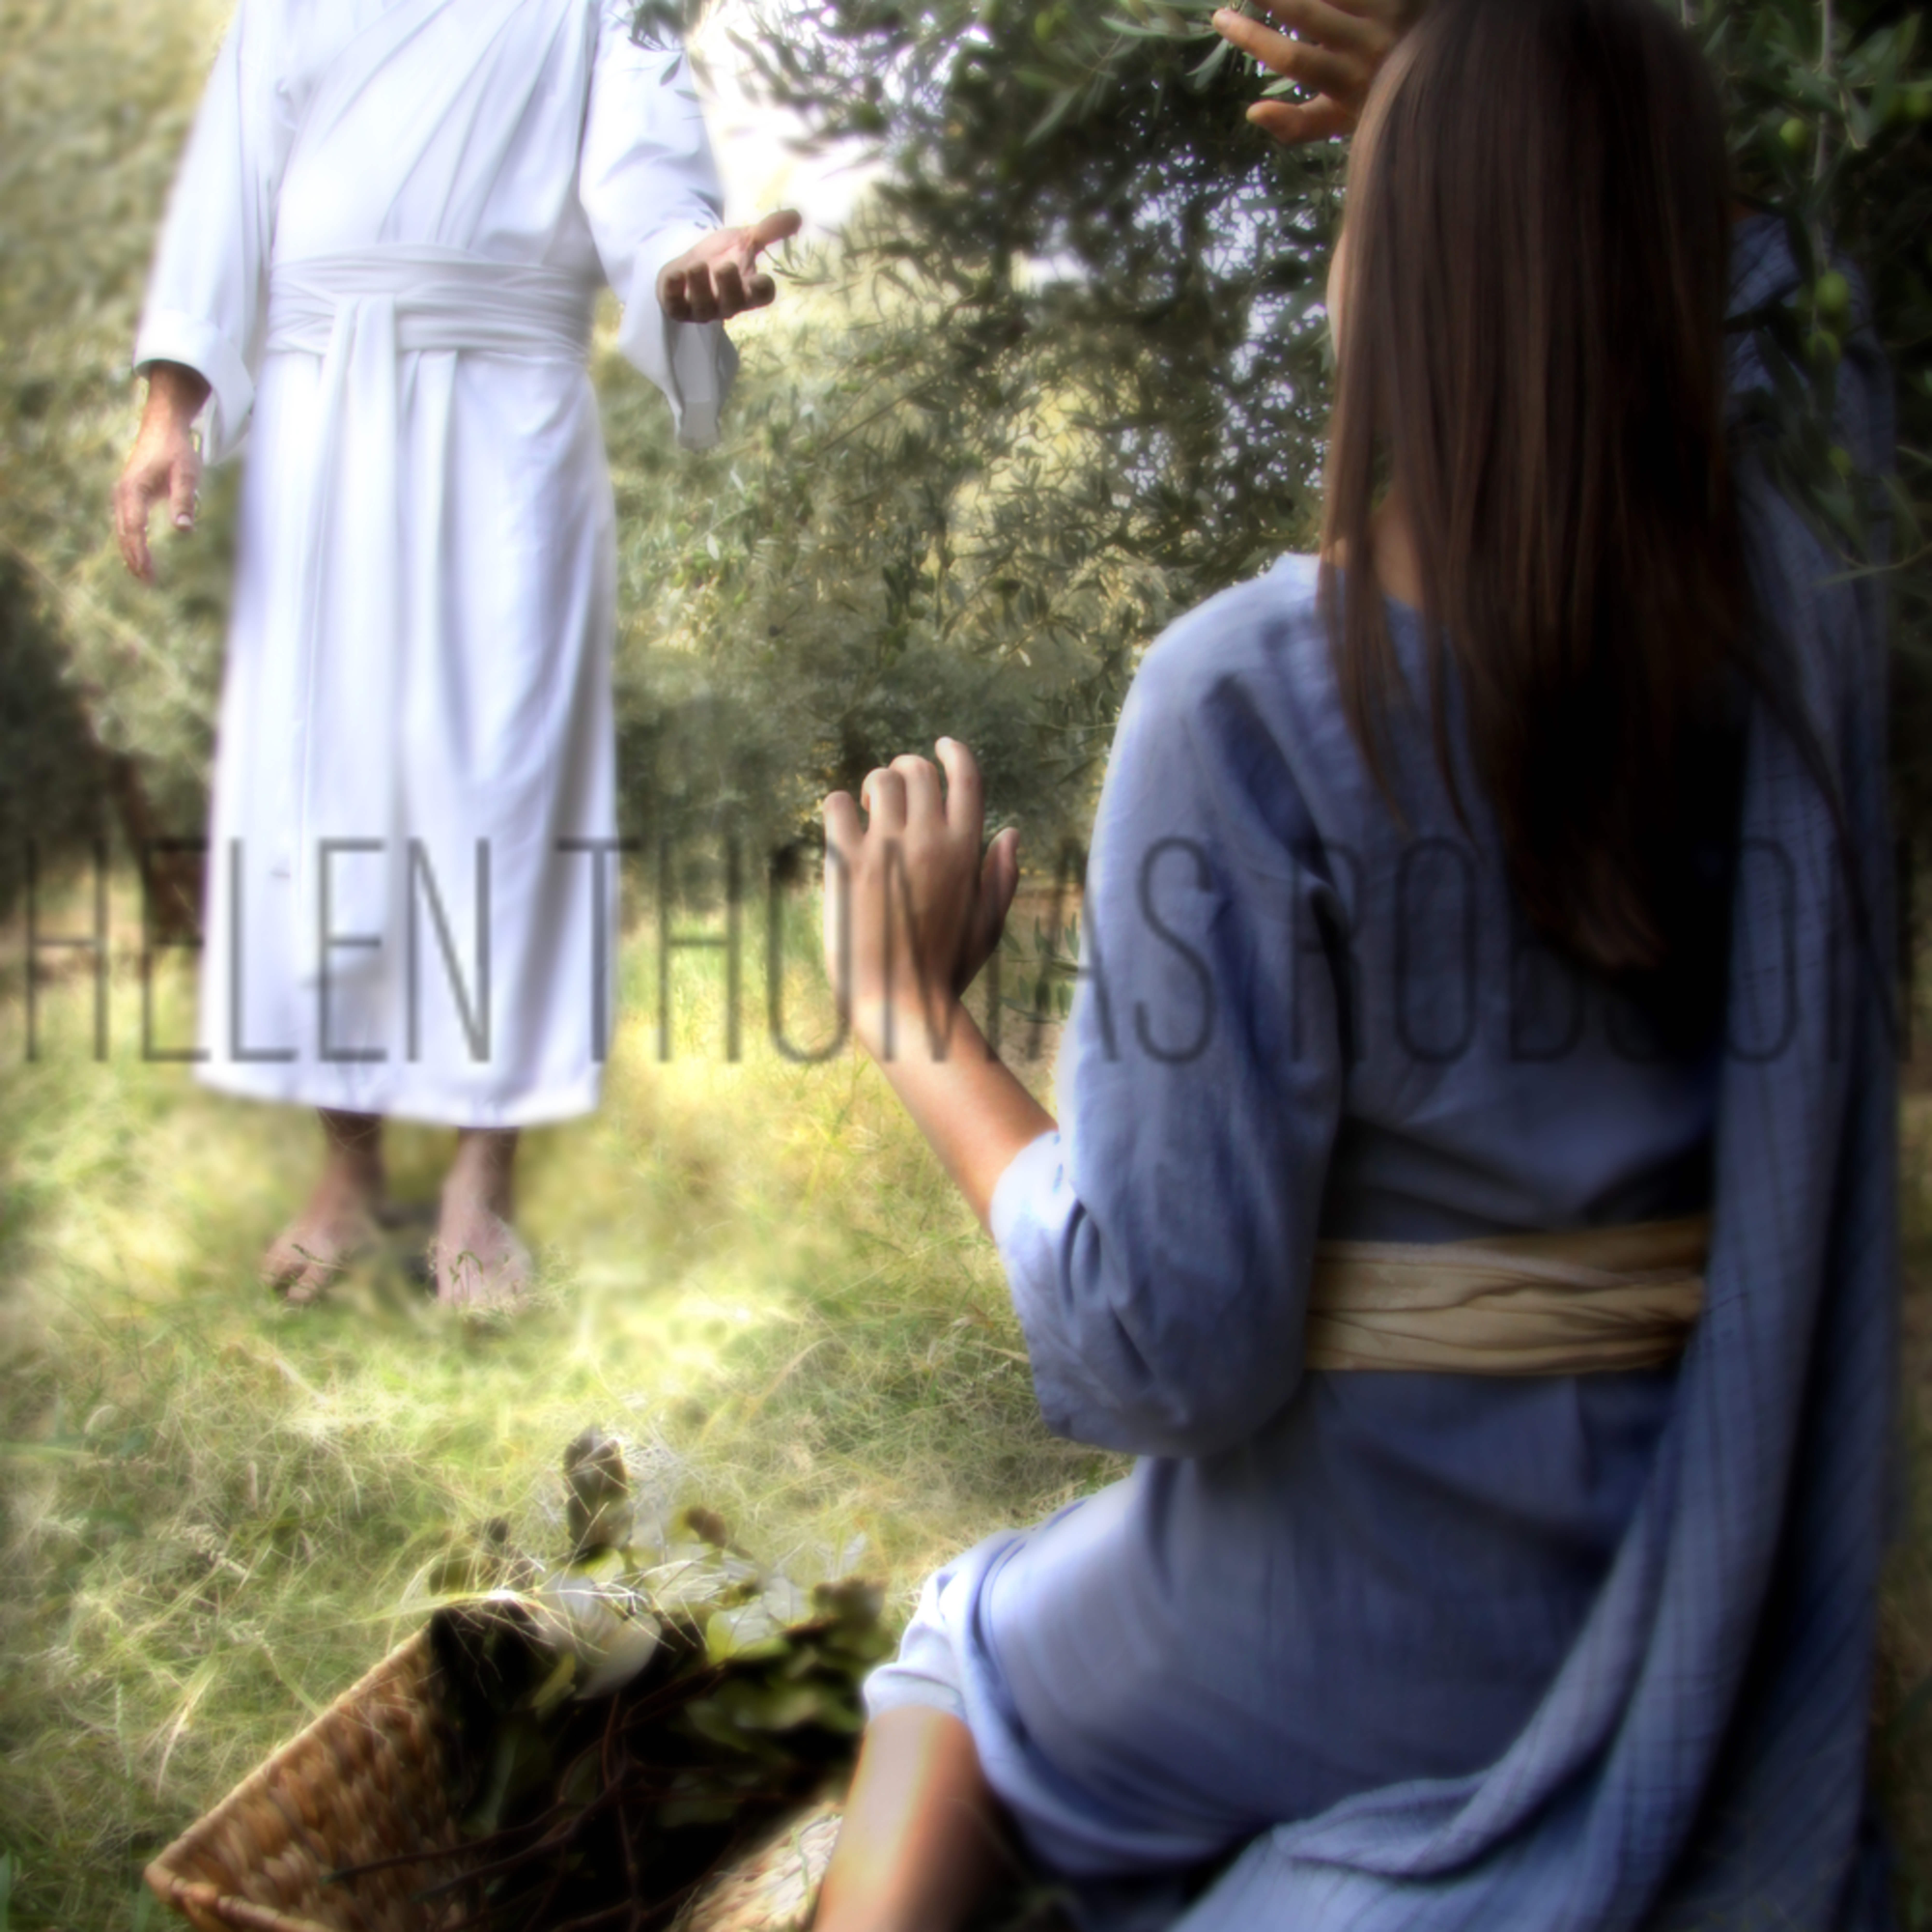 Luke2 blessed art thou among women 60x40 o4ecx2